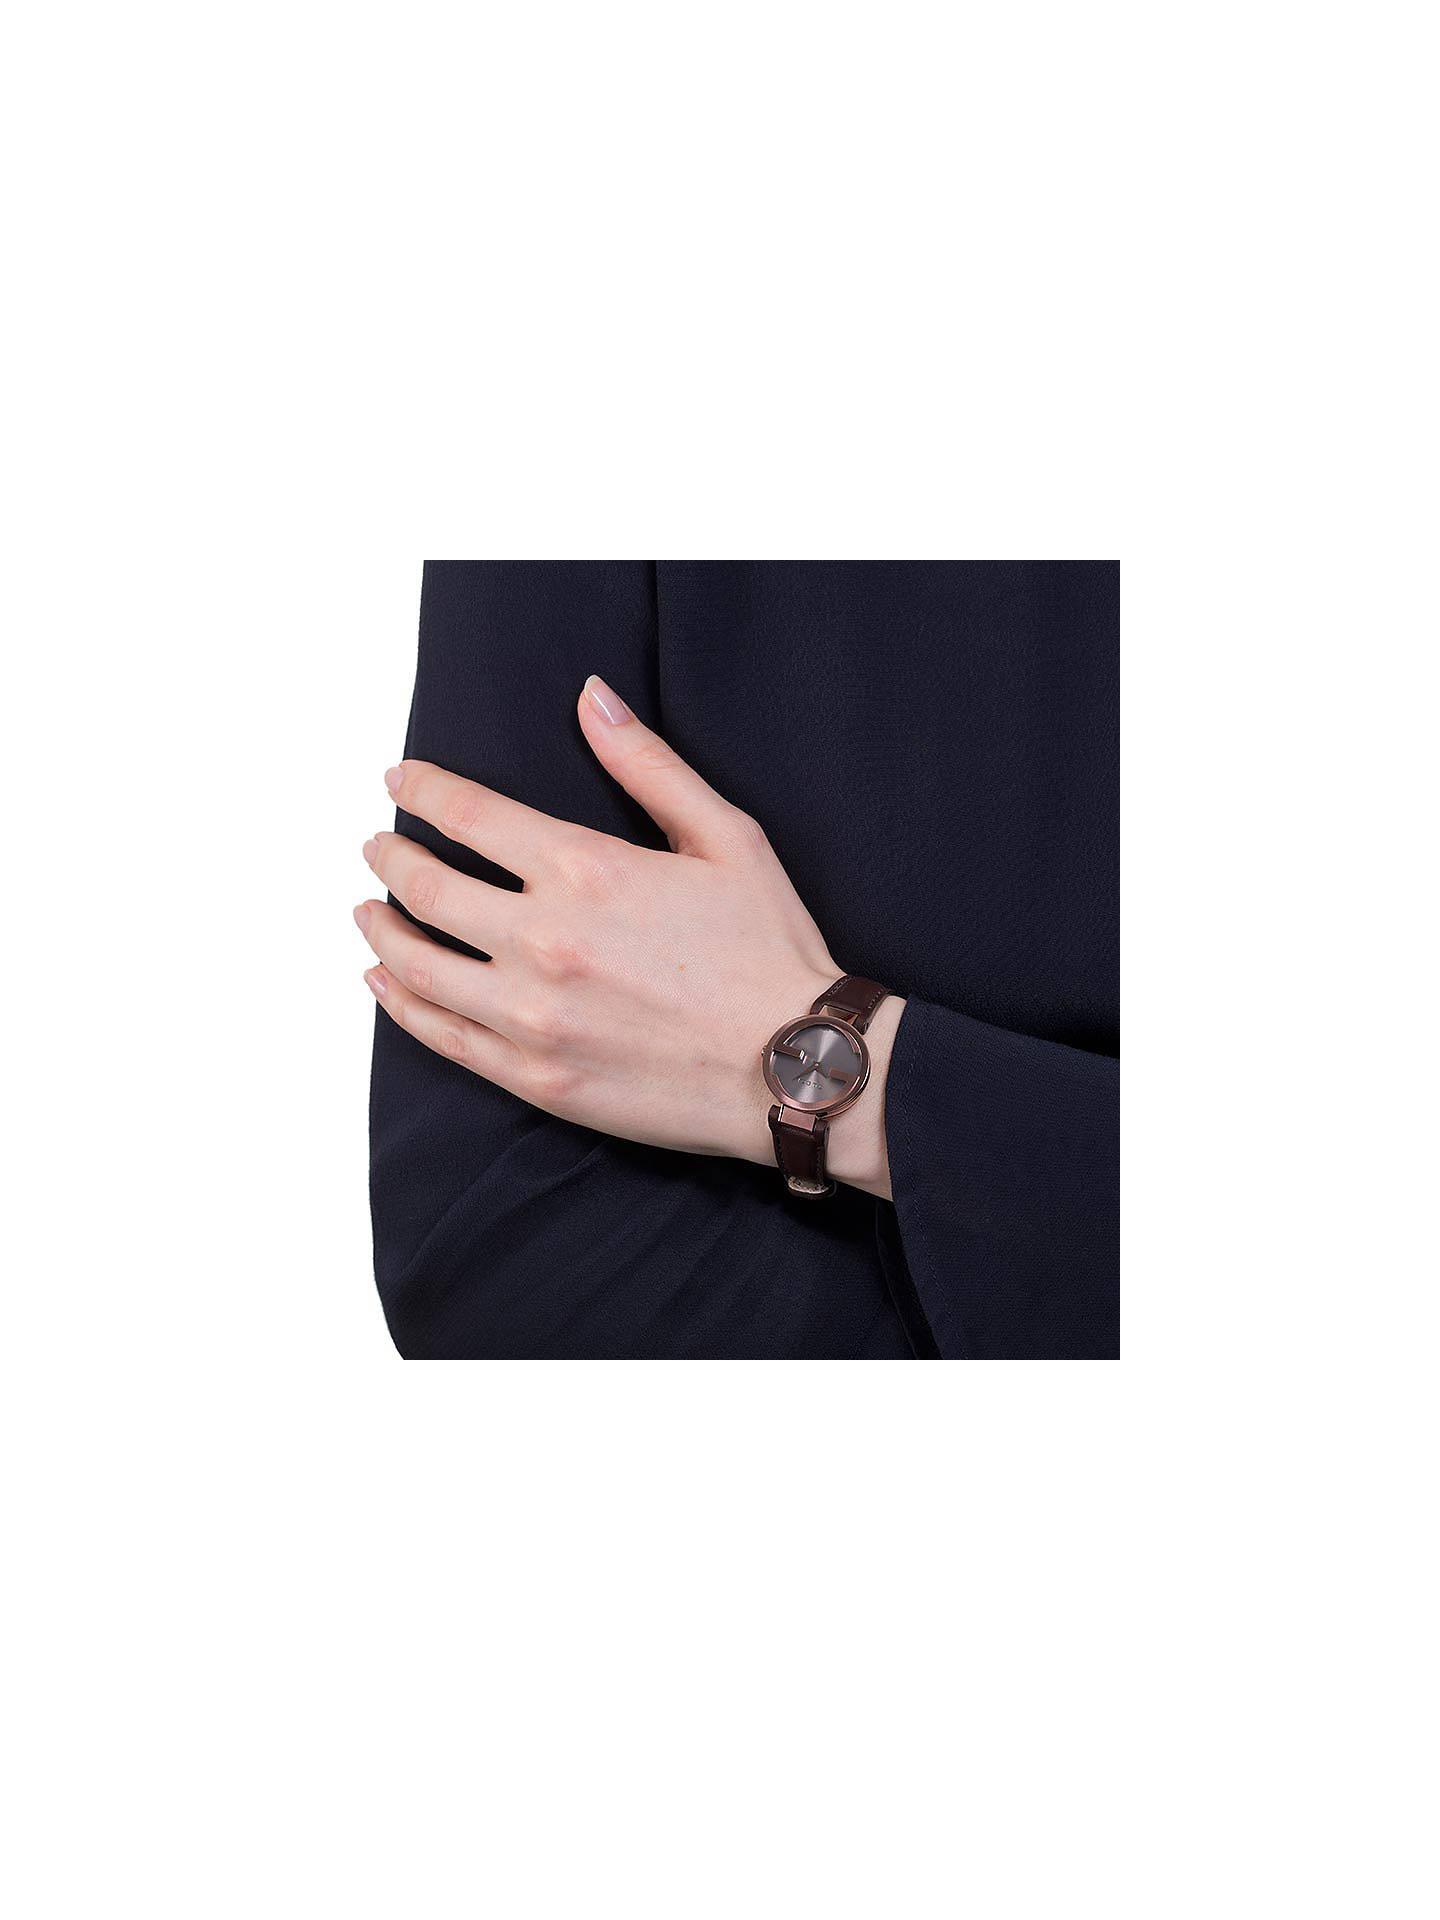 8b1d19b8e44 ... Buy Gucci YA133504 Women s Interlocking G Leather Strap Watch